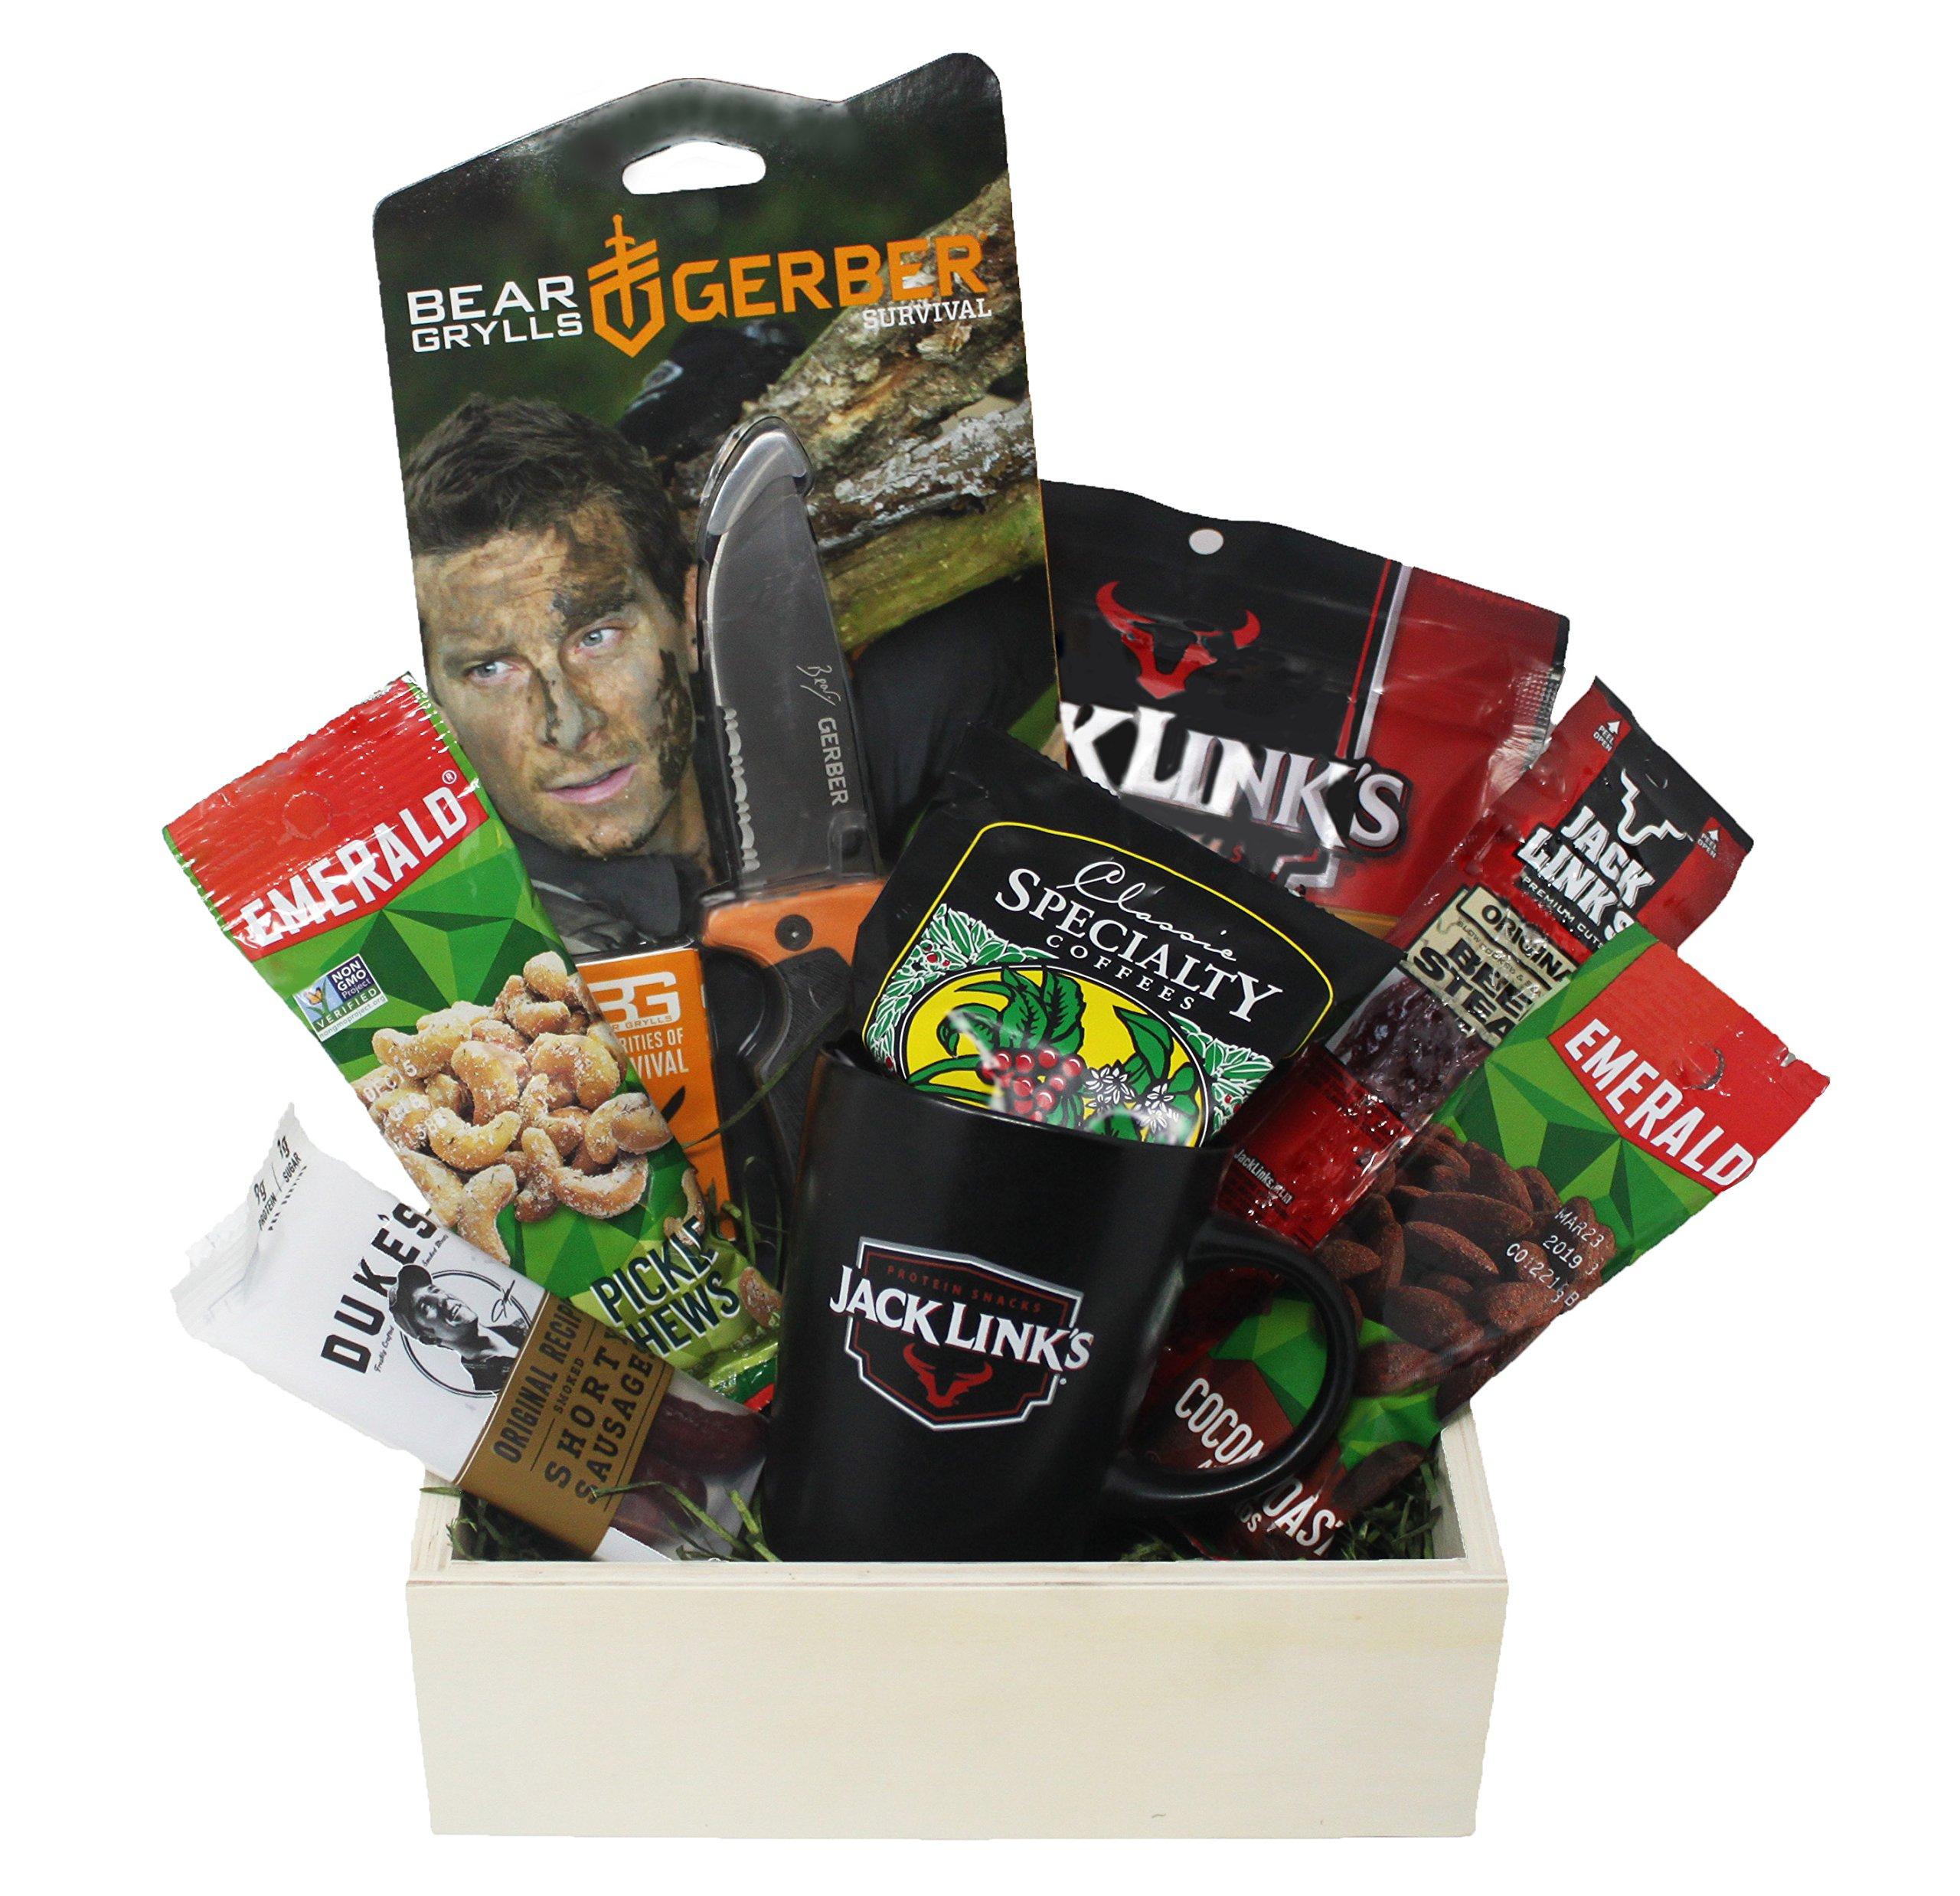 Gerber Folding Knife Protein Snack Basket for Men | Gifts for the Outdoorsman